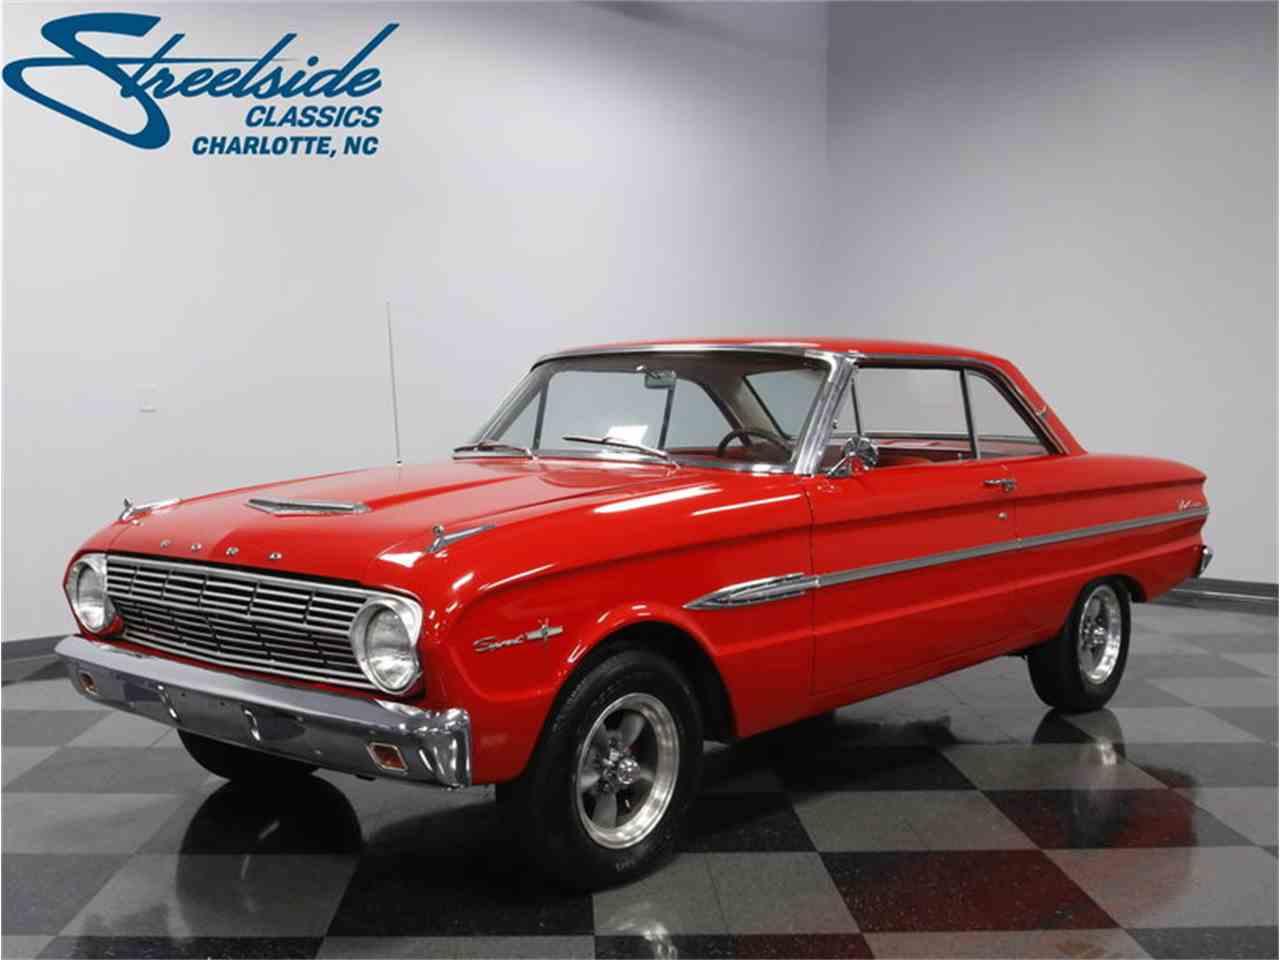 1963 Ford Falcon Sprint Tribute for Sale | ClassicCars.com | CC-1042267